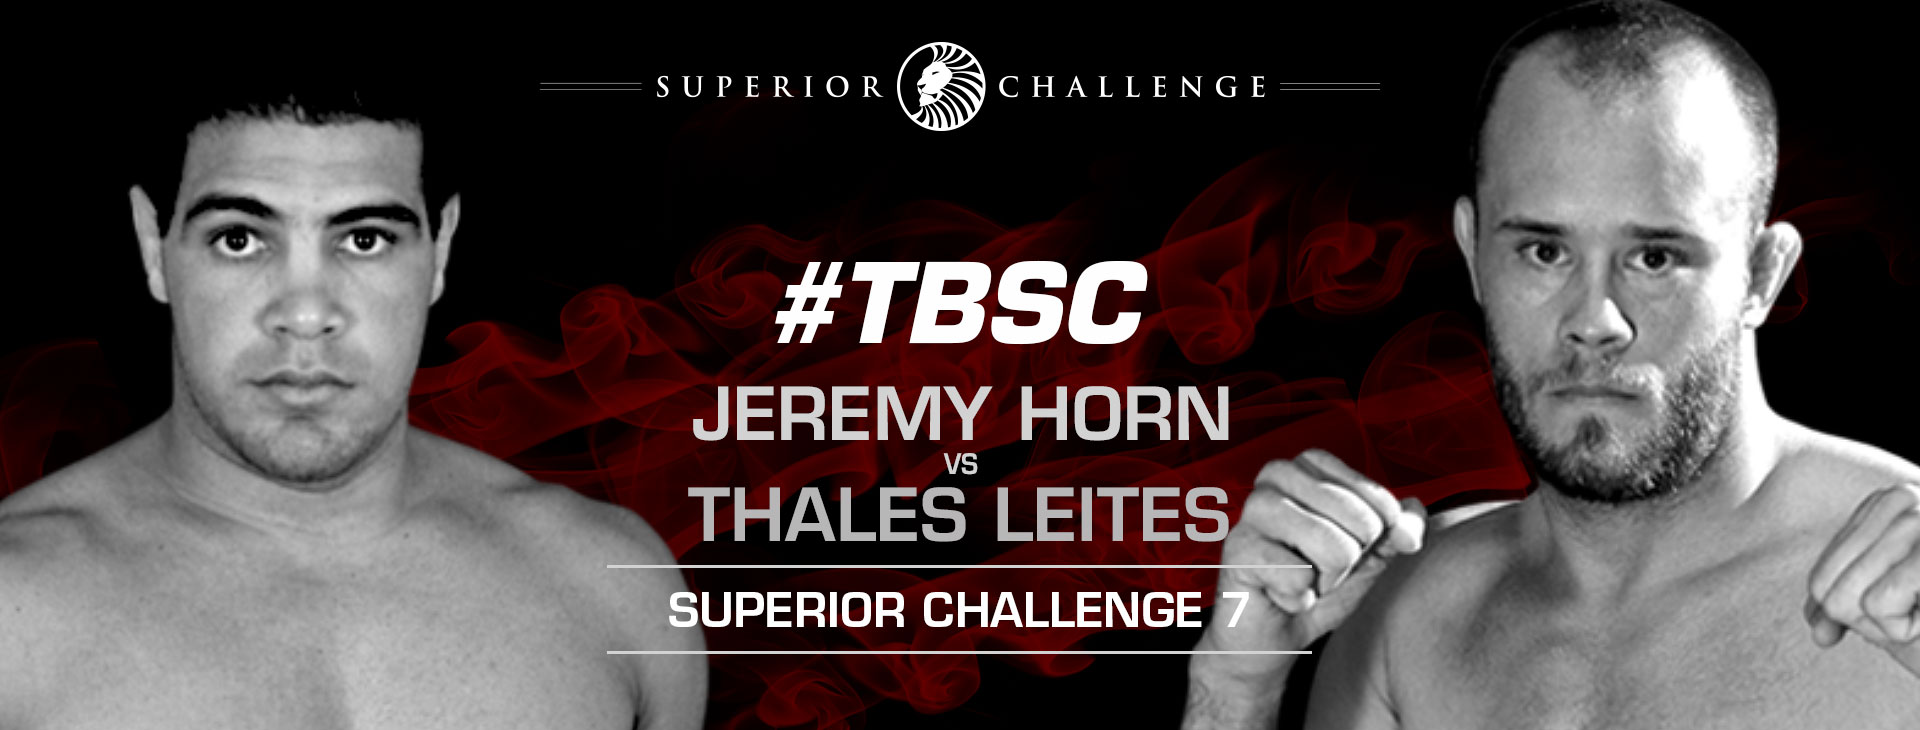 Jeremy Horn vs Thales Leites Superior Challenge 7